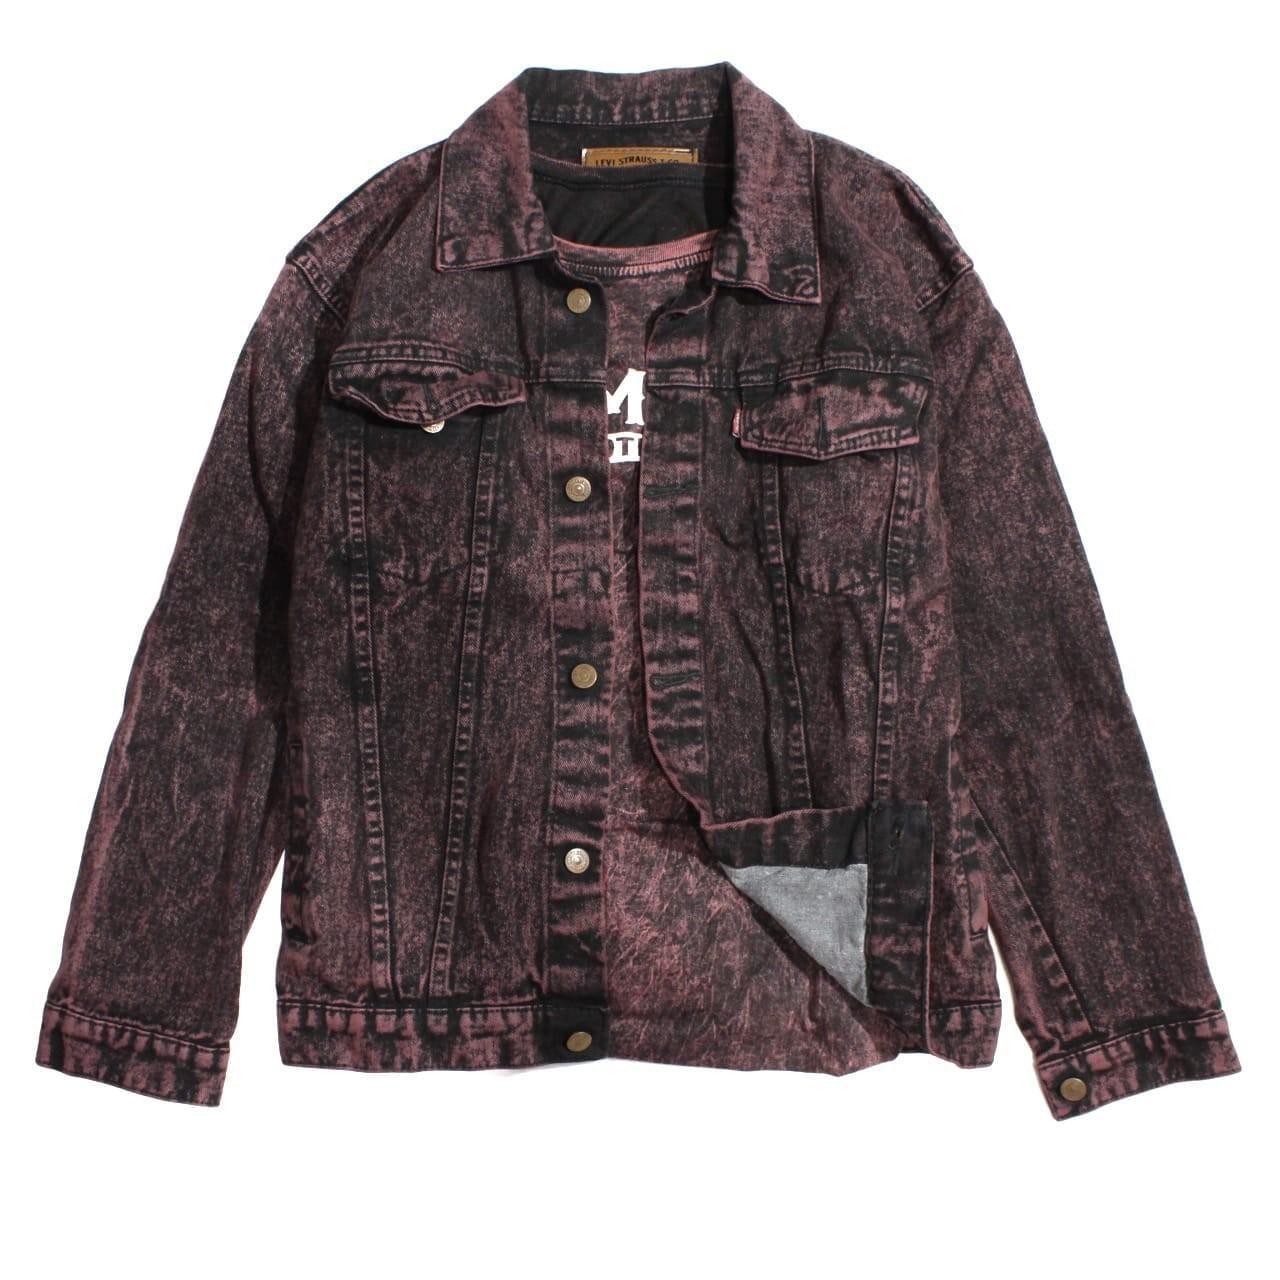 Fashion Level Up Daftar Harga November 2018 Wakai Mikkusu Maroon Grey Black Sepatu Slip On Wak0002551zz895 Hitam 36